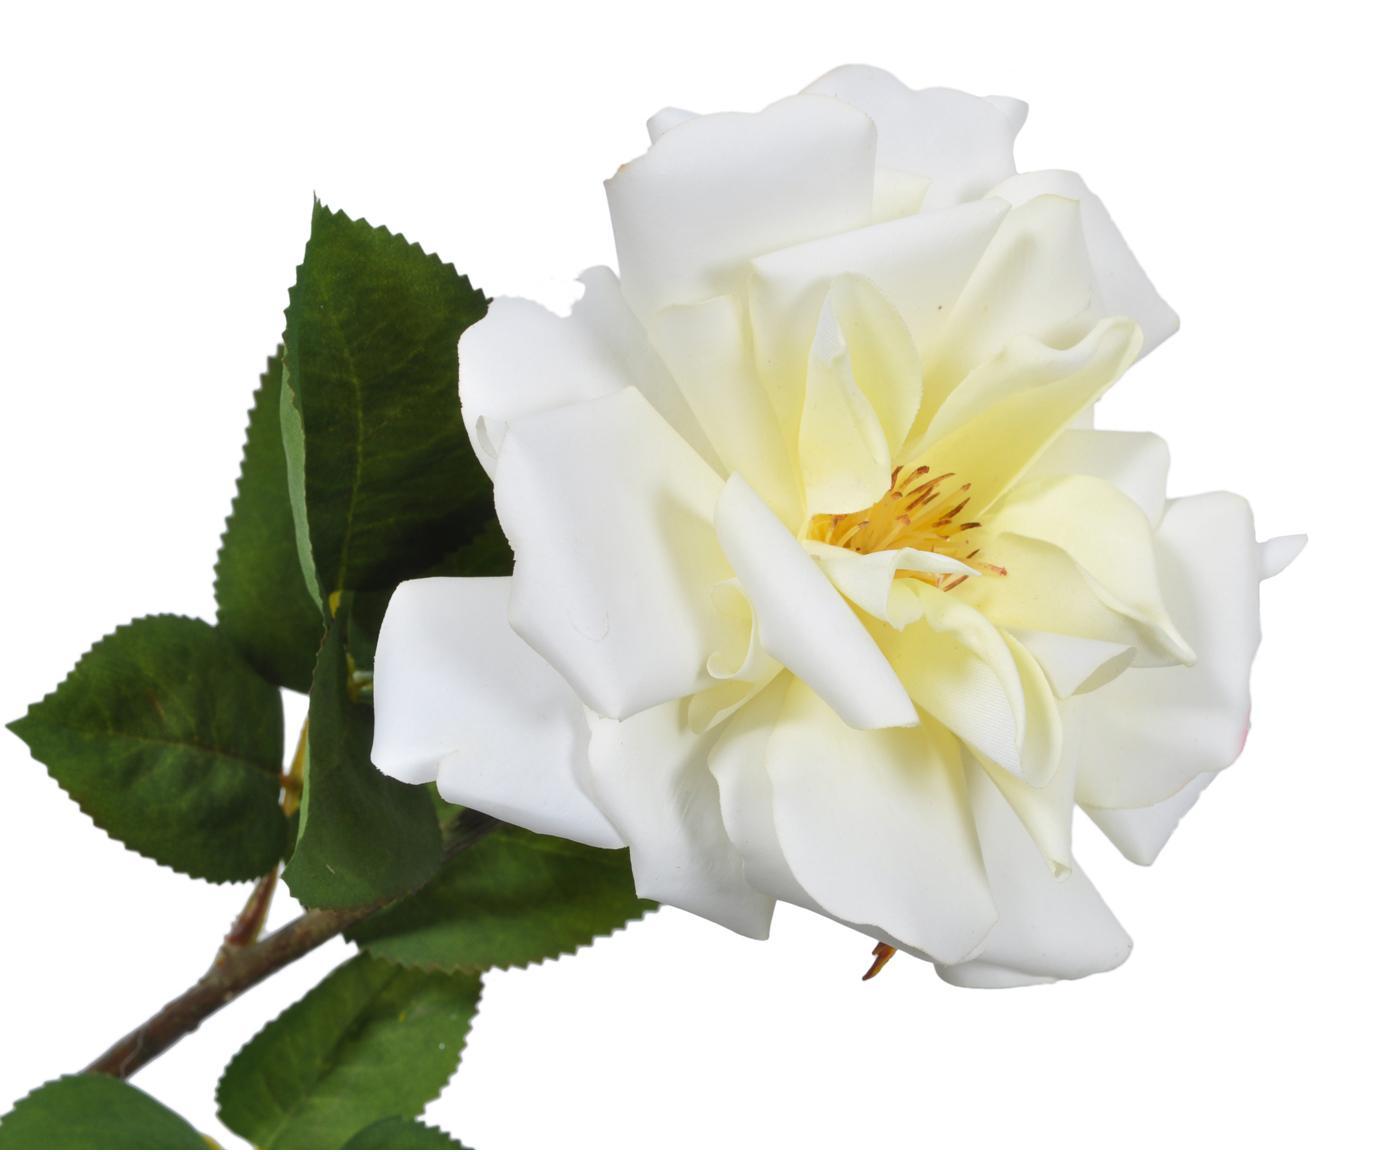 Kunstblume Rose Alina, Blüte: Kunststoff, Stiel: Metall, Weiss, Gelb, L 54 cm